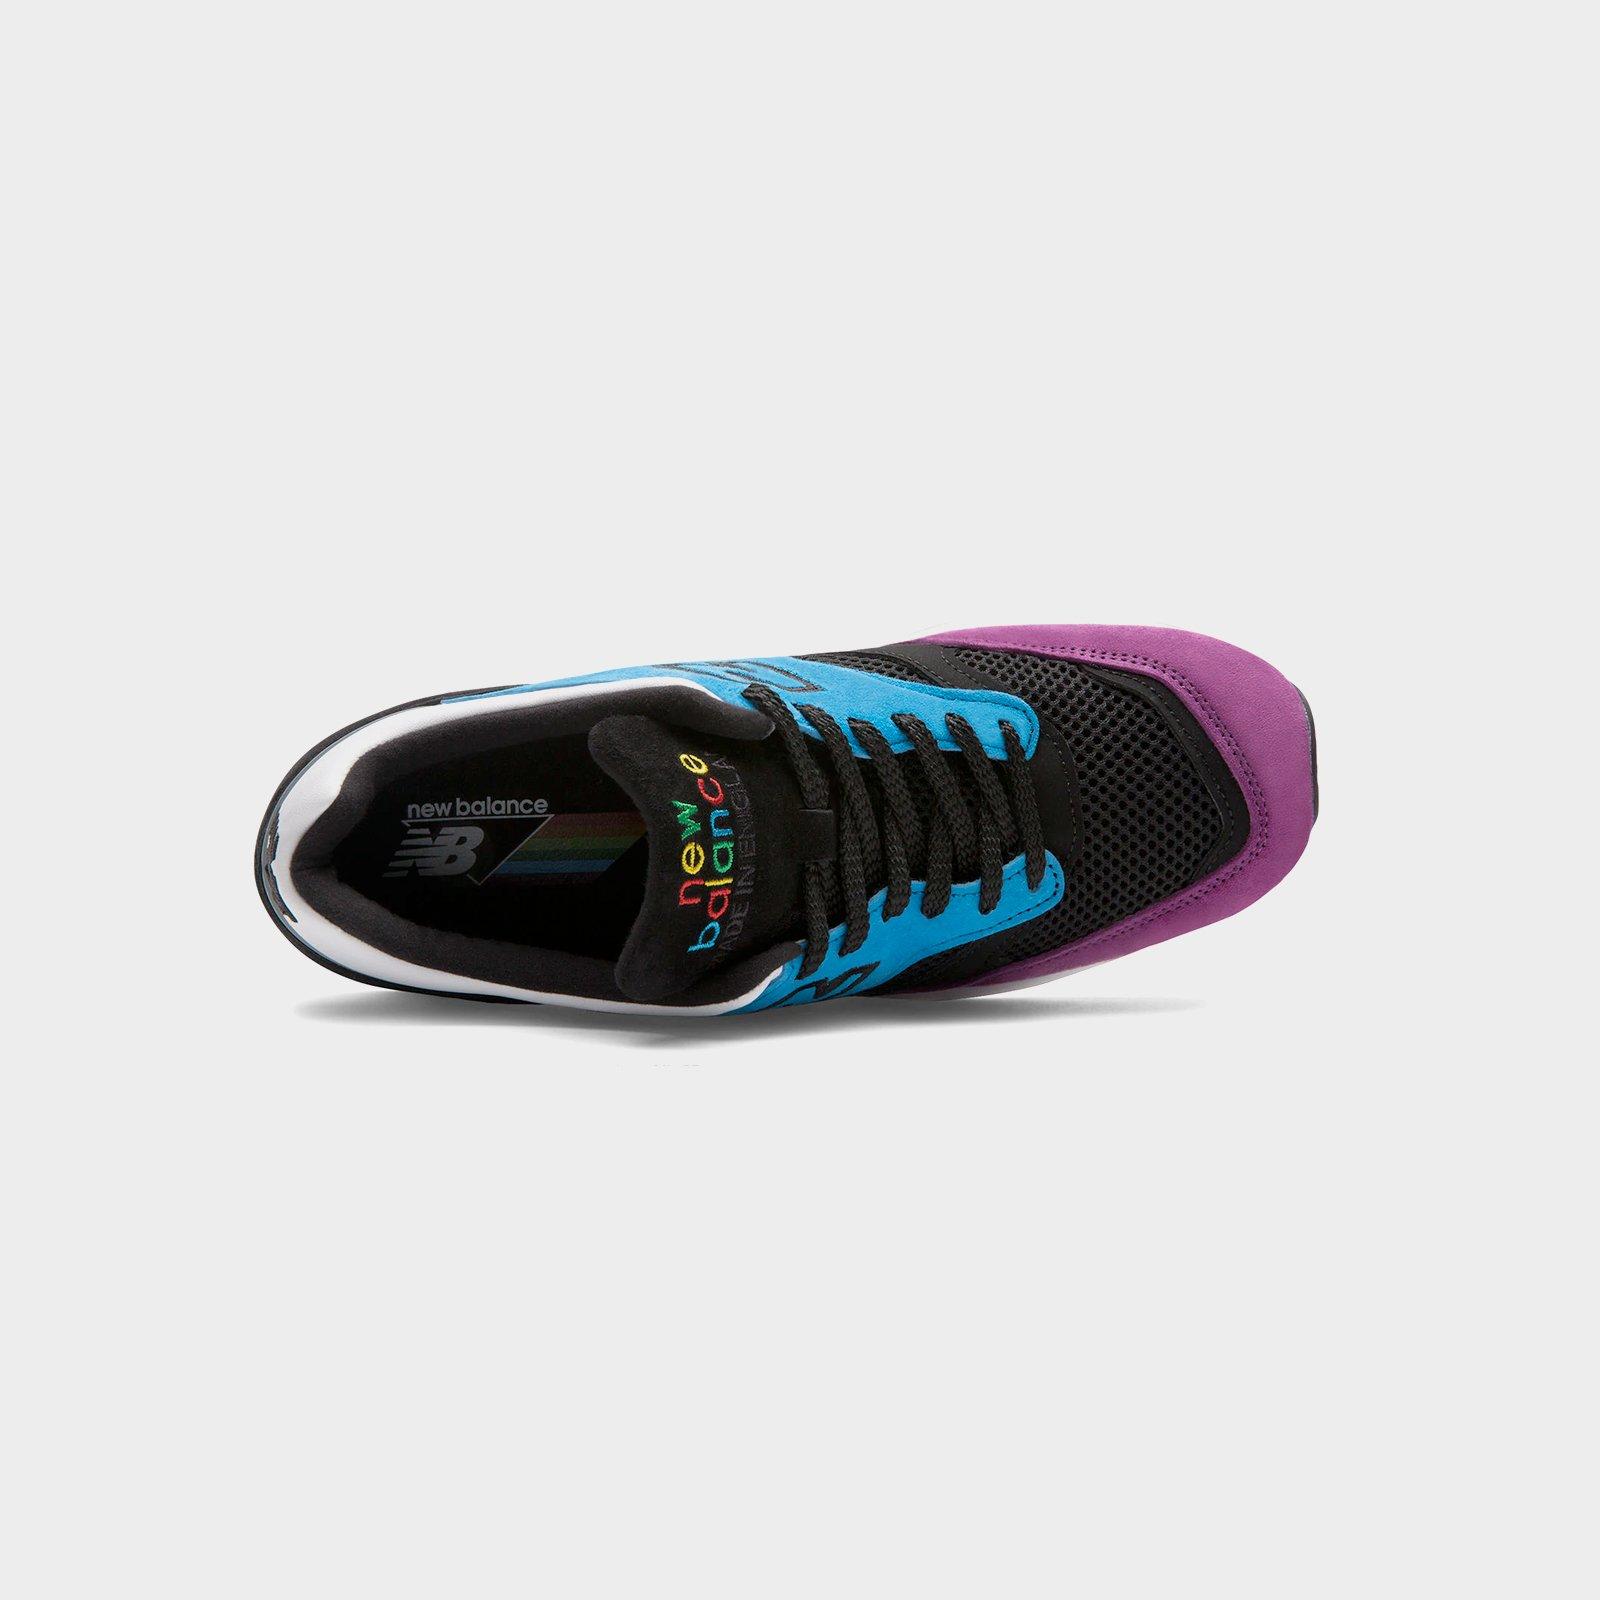 New Balance M1500 - M1500cbk - Sneakersnstuff | sneakers ...